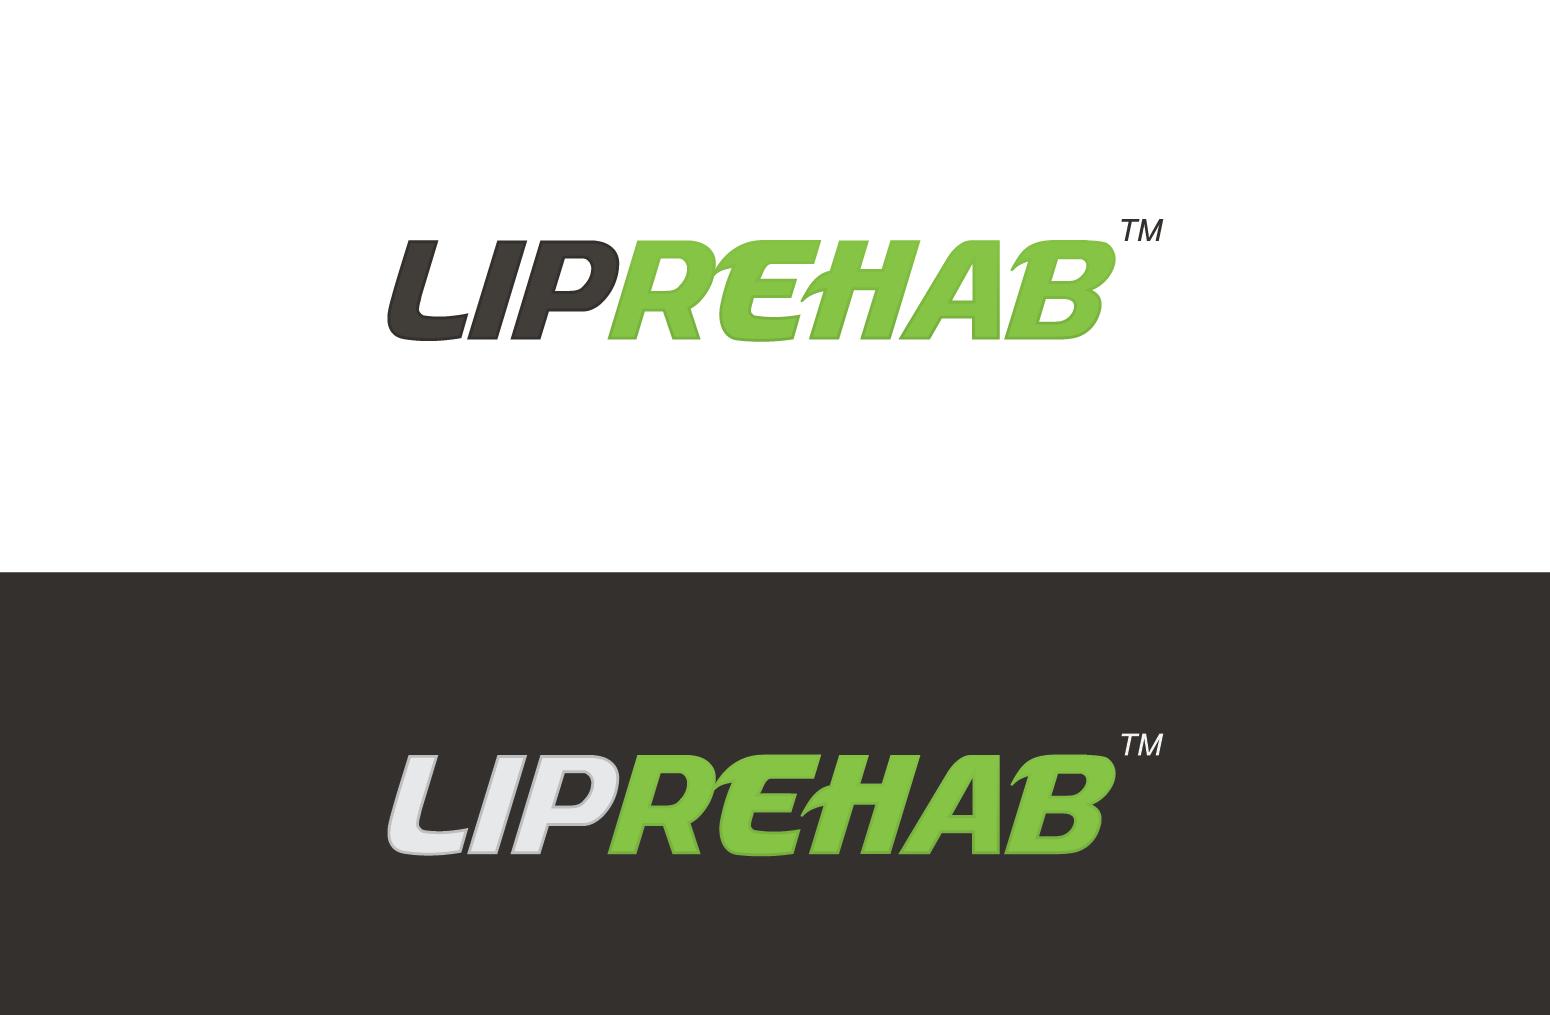 Logo Design by Dipin Bishwakarma - Entry No. 290 in the Logo Design Contest Creative Logo Design for Lip Rehab.